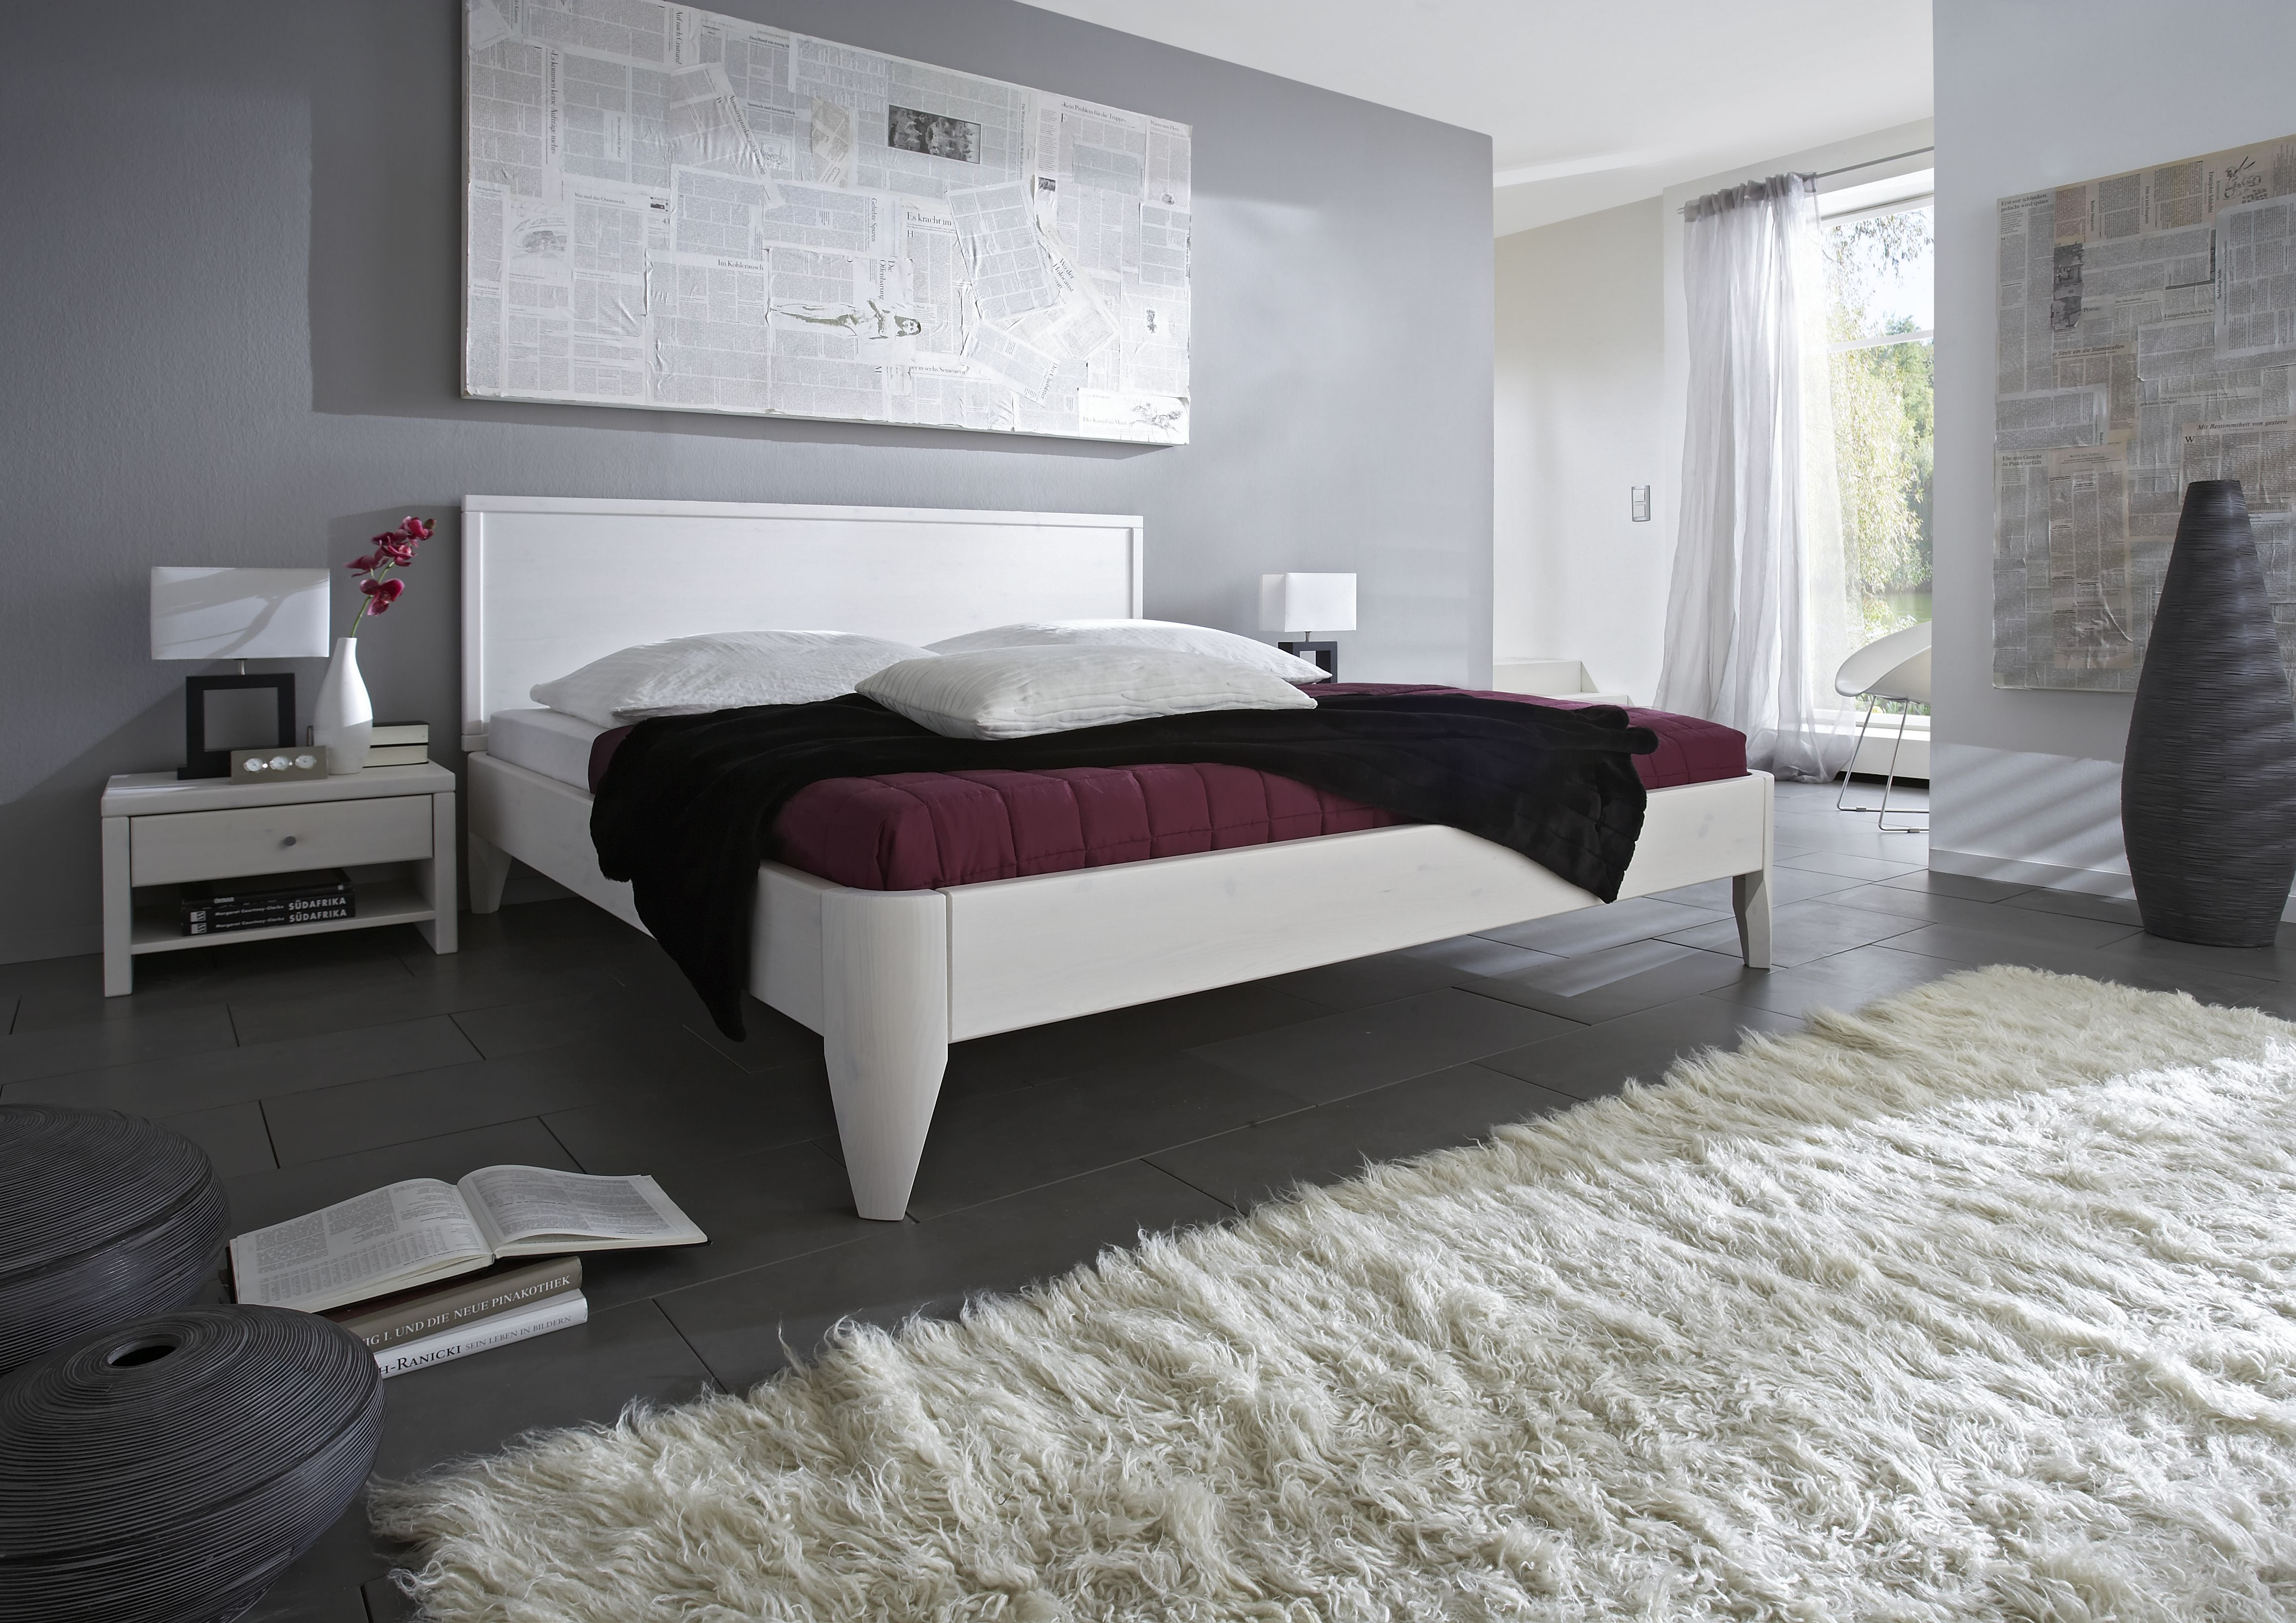 Holzbett Kiefer massiv weiß lackiert Easy Sleep